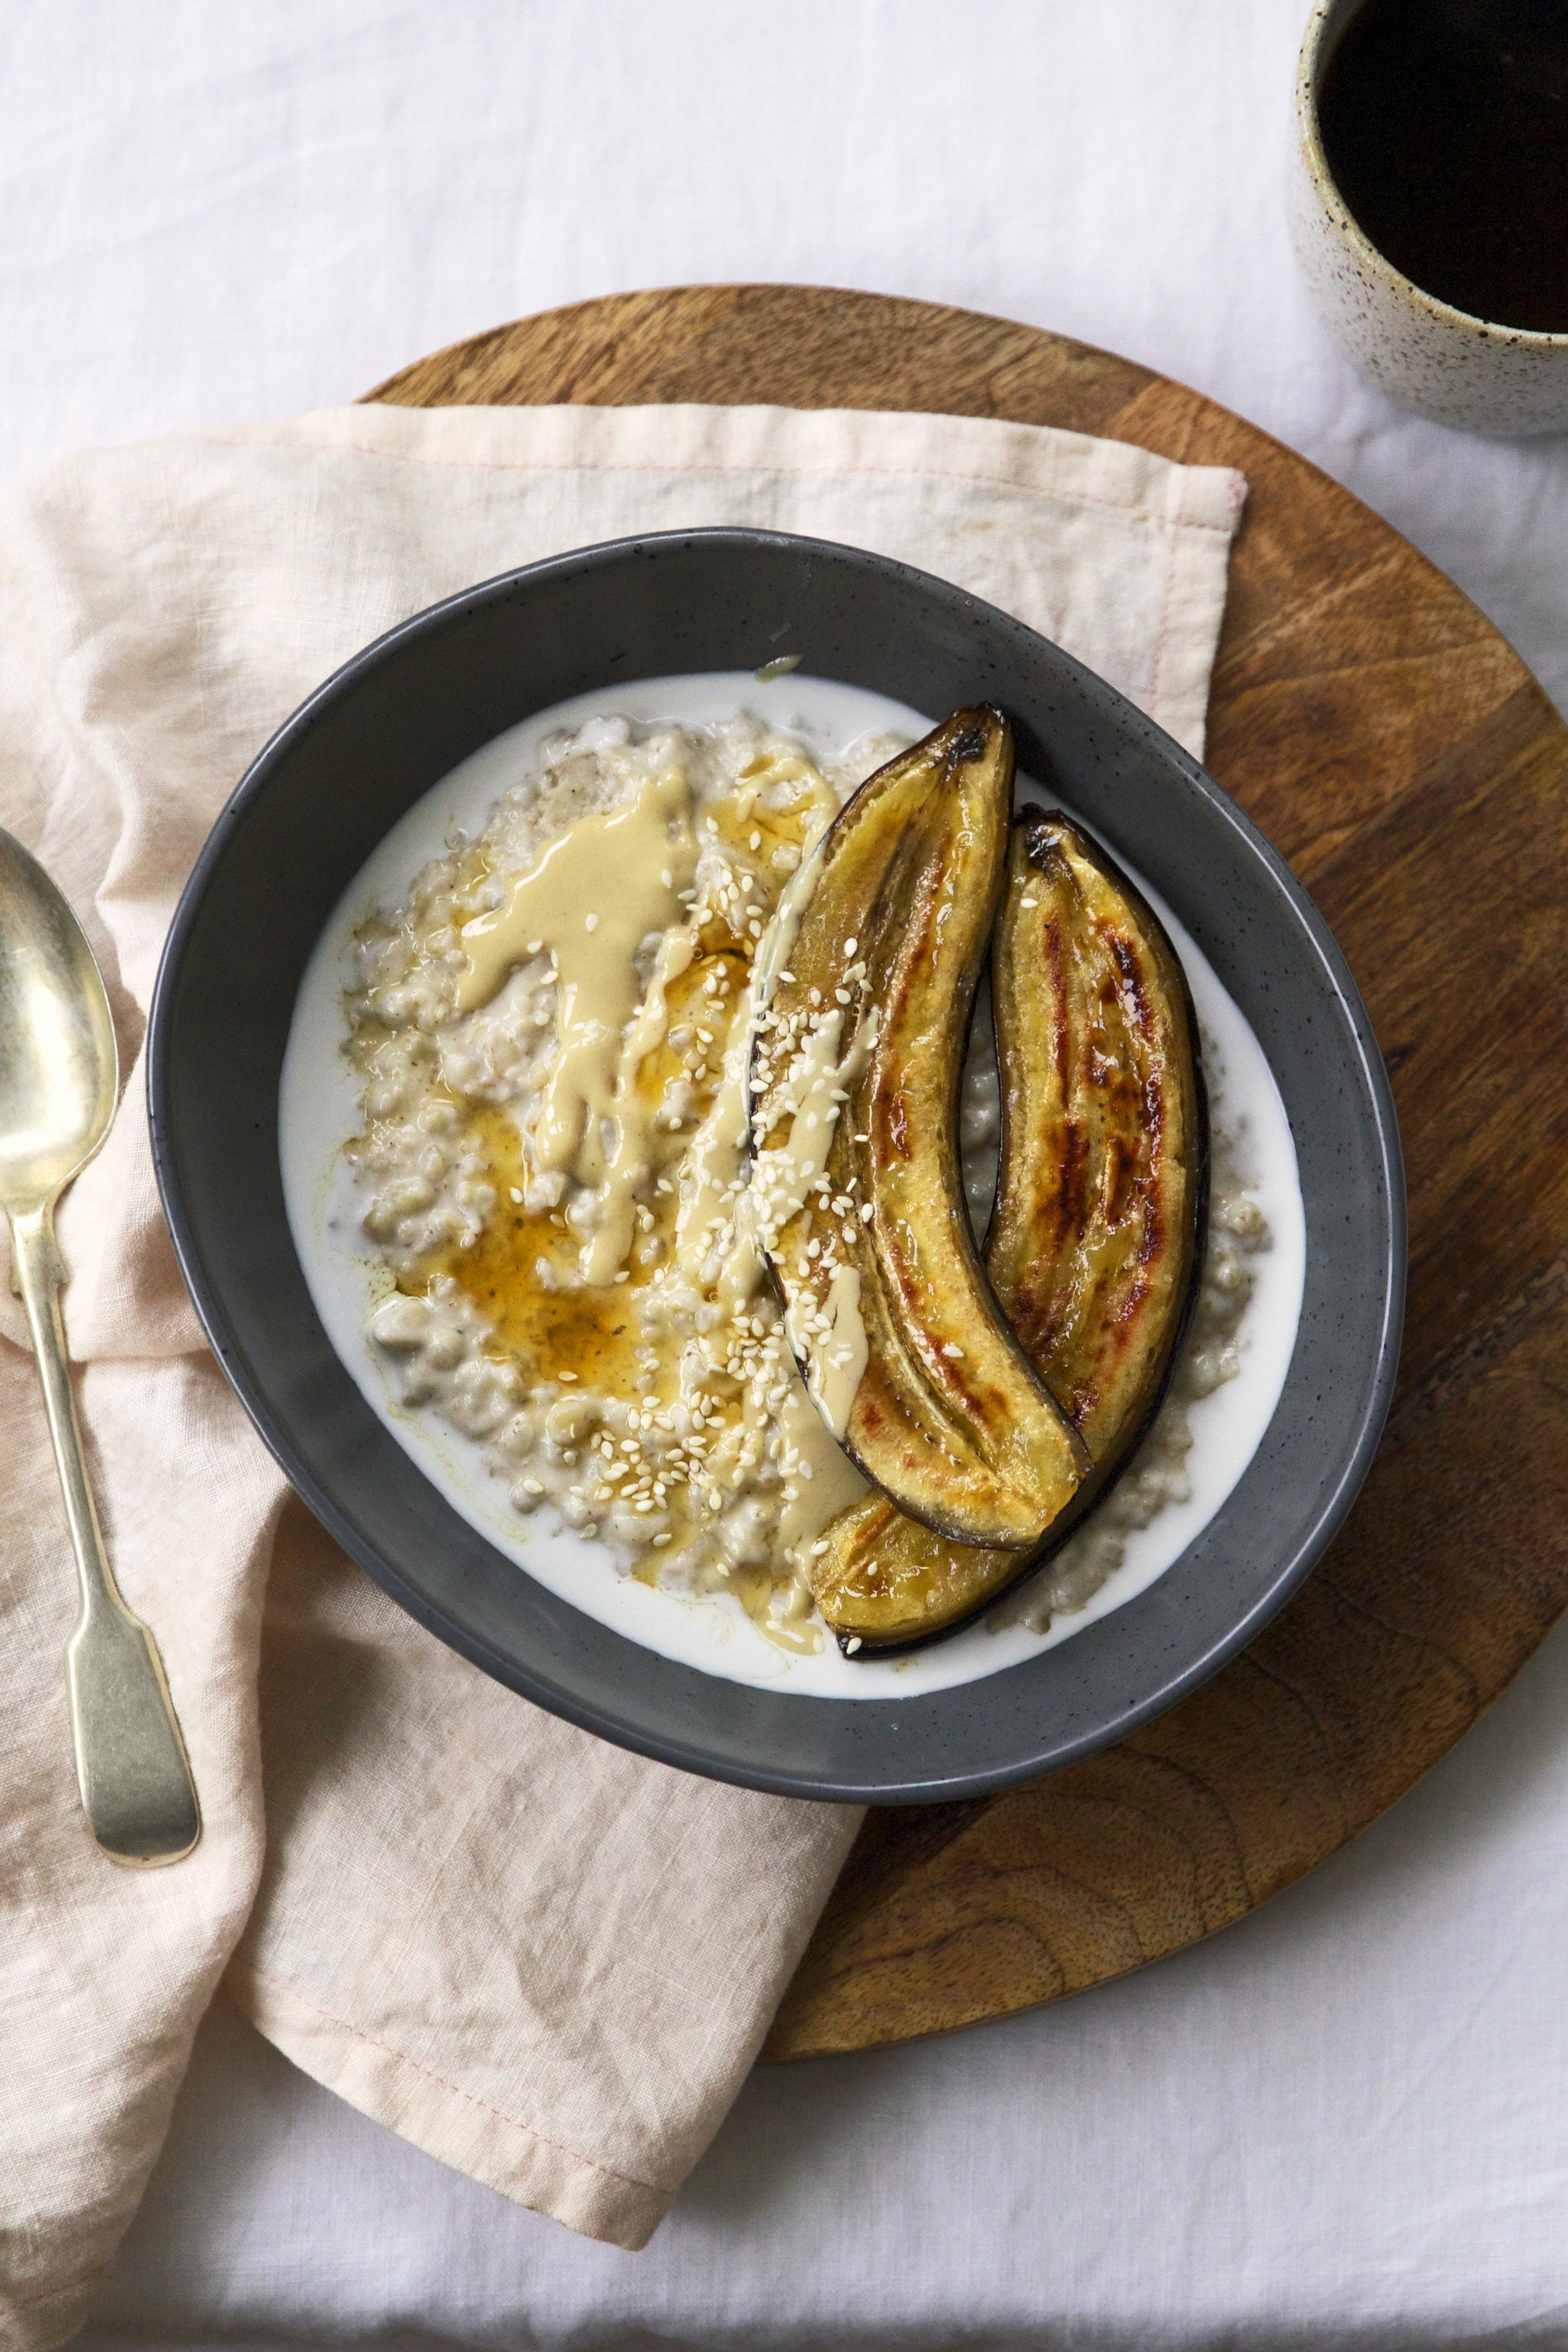 ALL GOOD_Low Res_Buckwheat tahini porridge toasted banana1.jpg